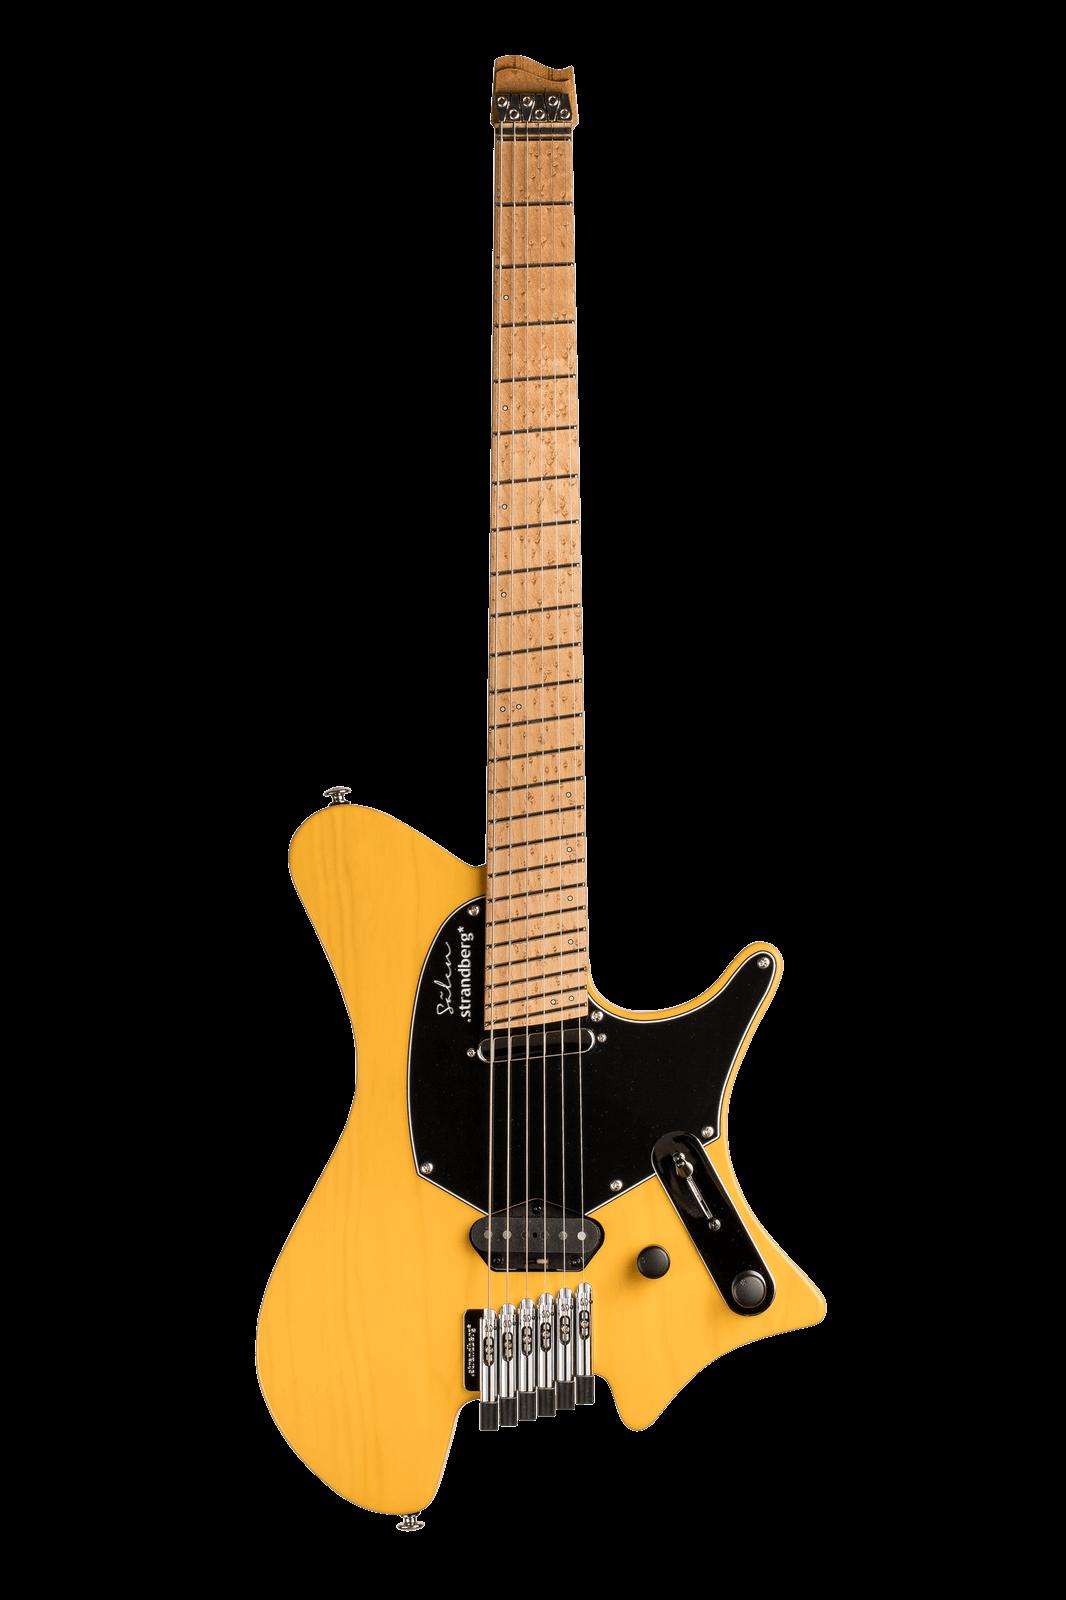 Pin By Cchei On Guitar Guitar Gadgets Music Guitar Guitar Design